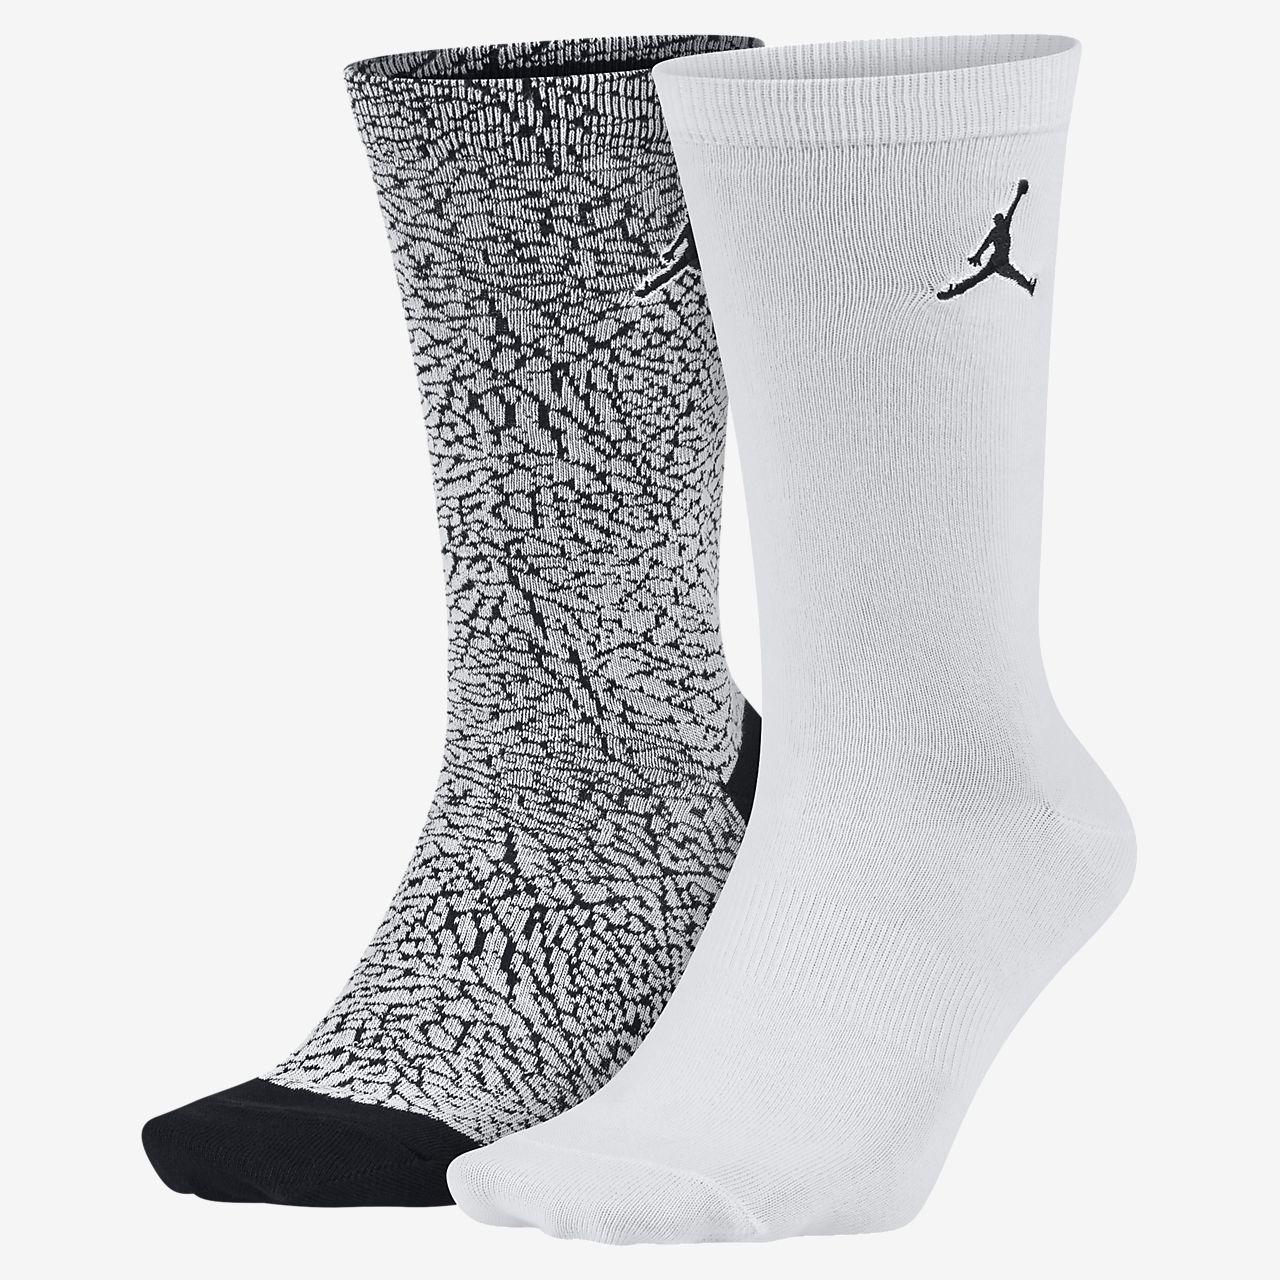 022b43da0f8c Jordan Elephant Print Crew Socks (2 Pair). Nike.com AU